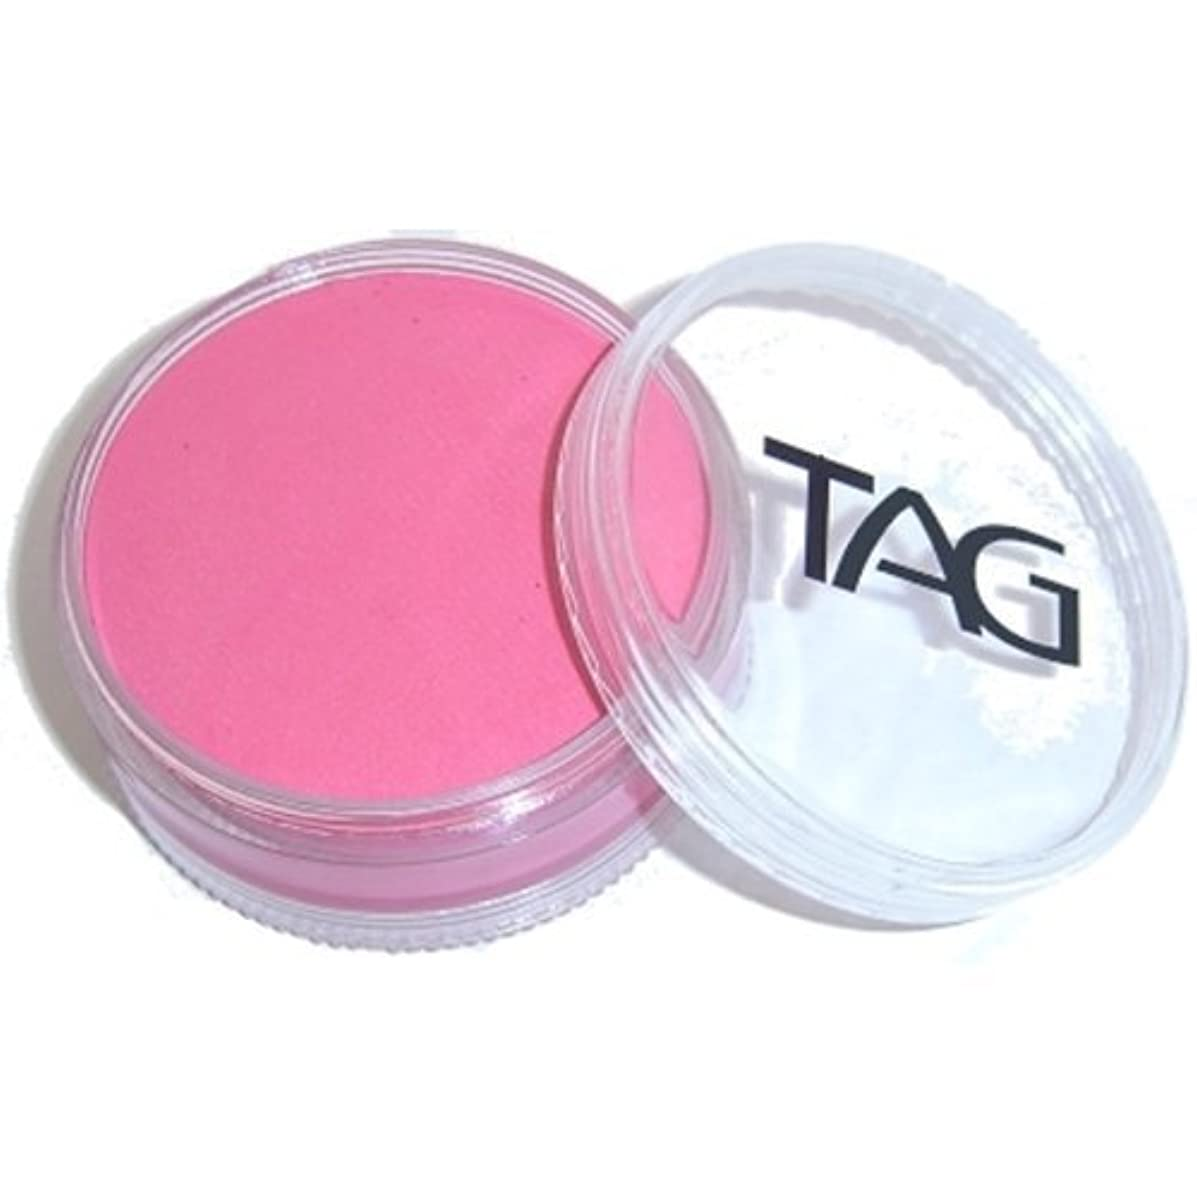 TAG Face Paint Regular - Pink (90g)